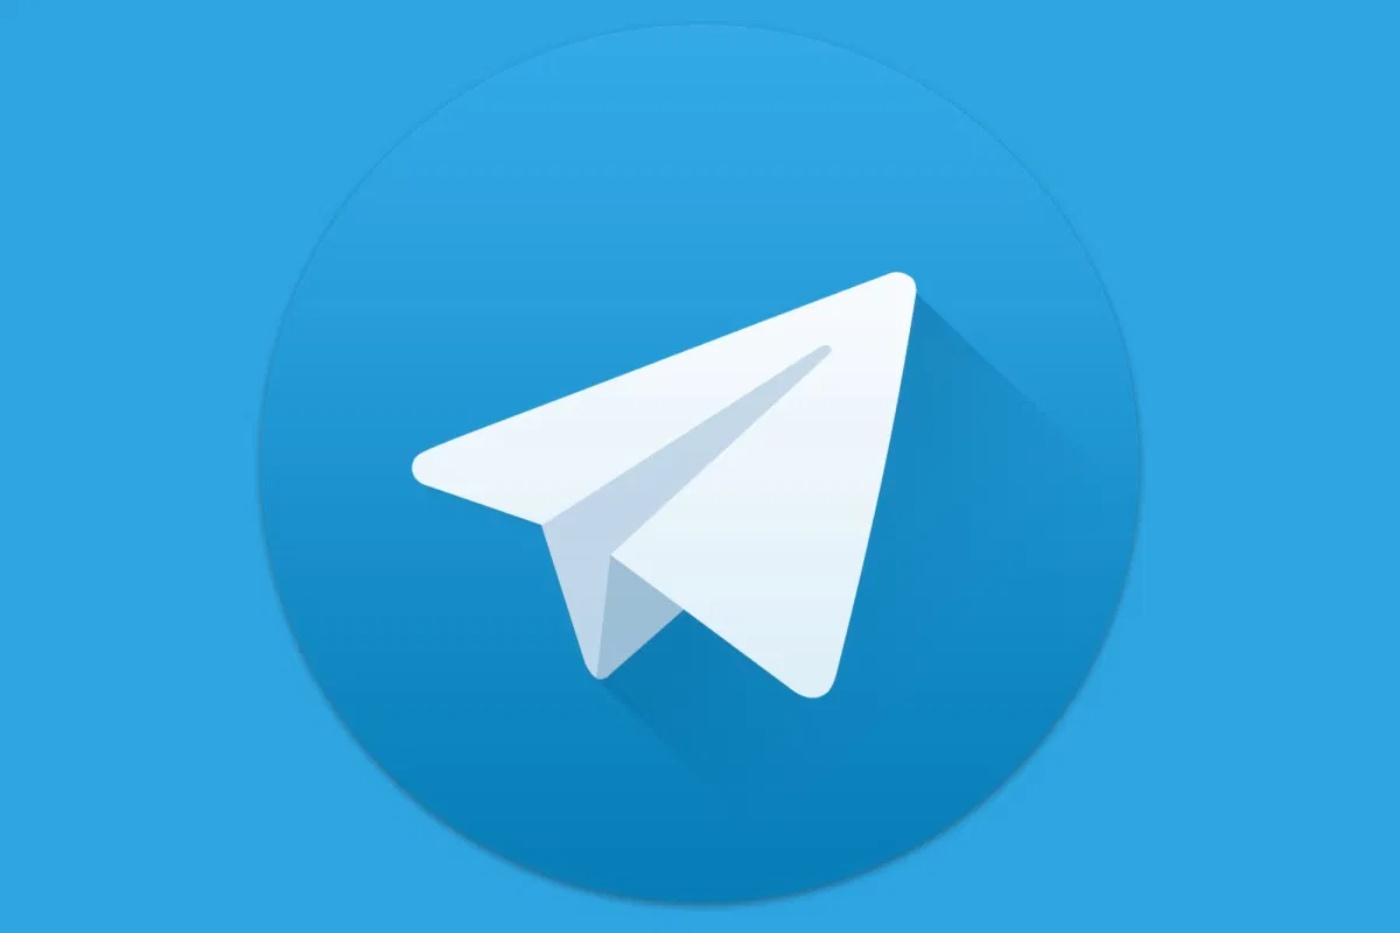 Telegram: WhatsApp's rival breaks user record »DUPLOS